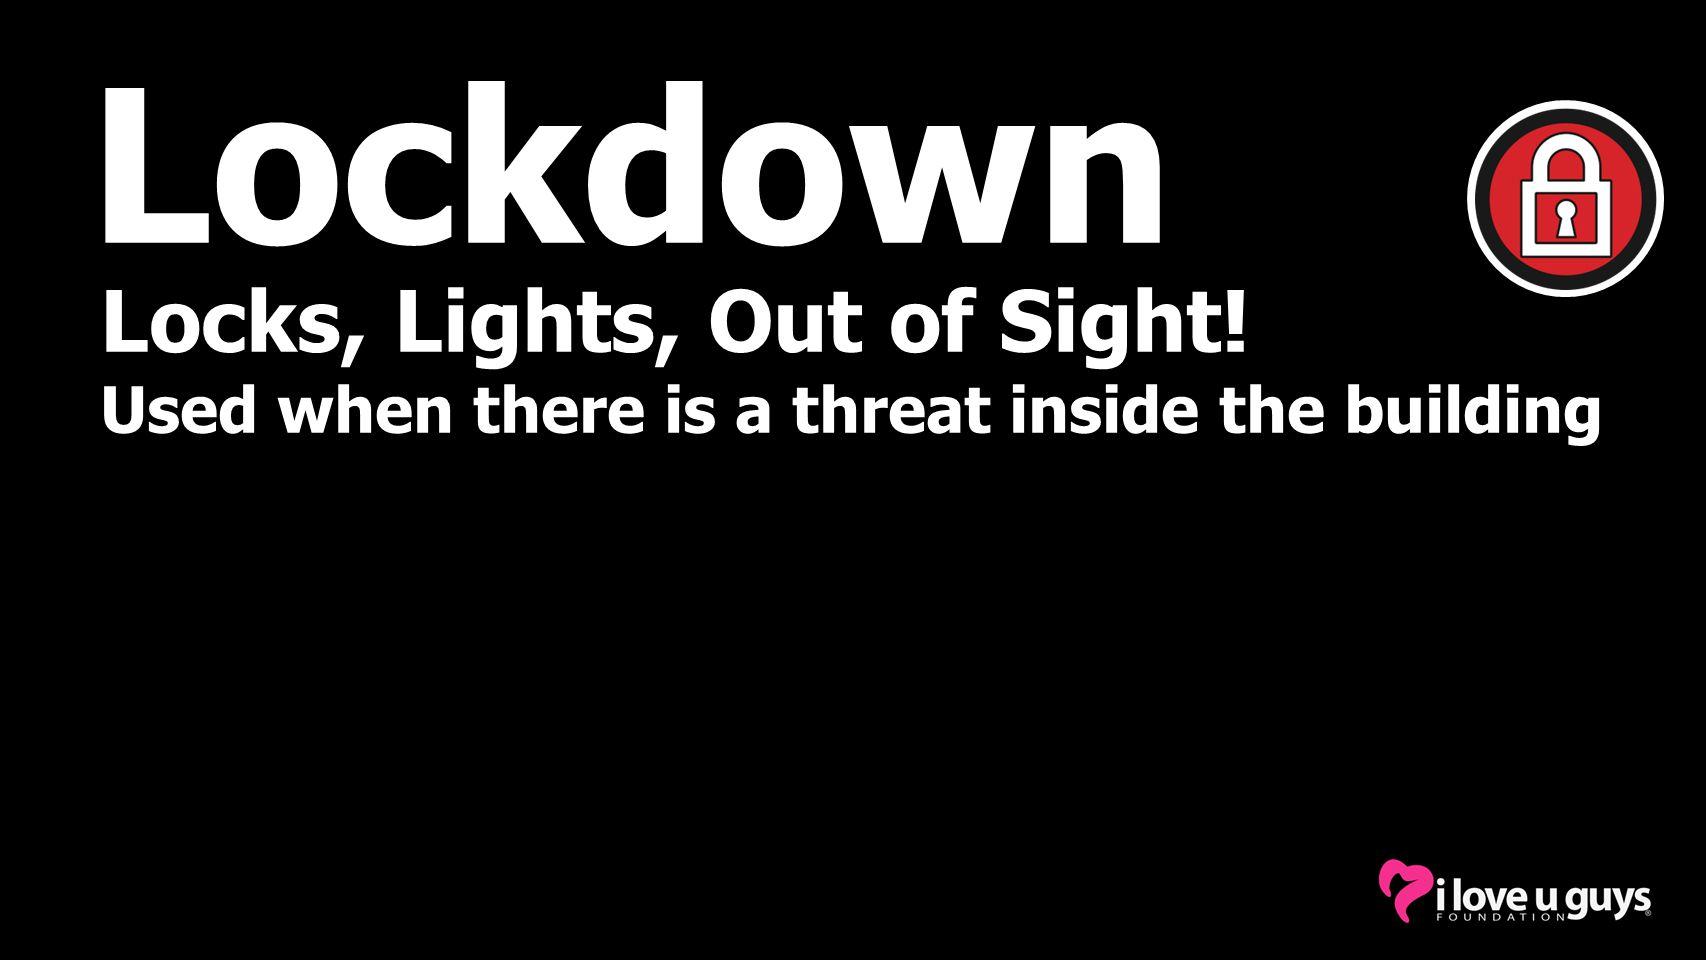 Lockdown Locks, Lights, Out of Sight!